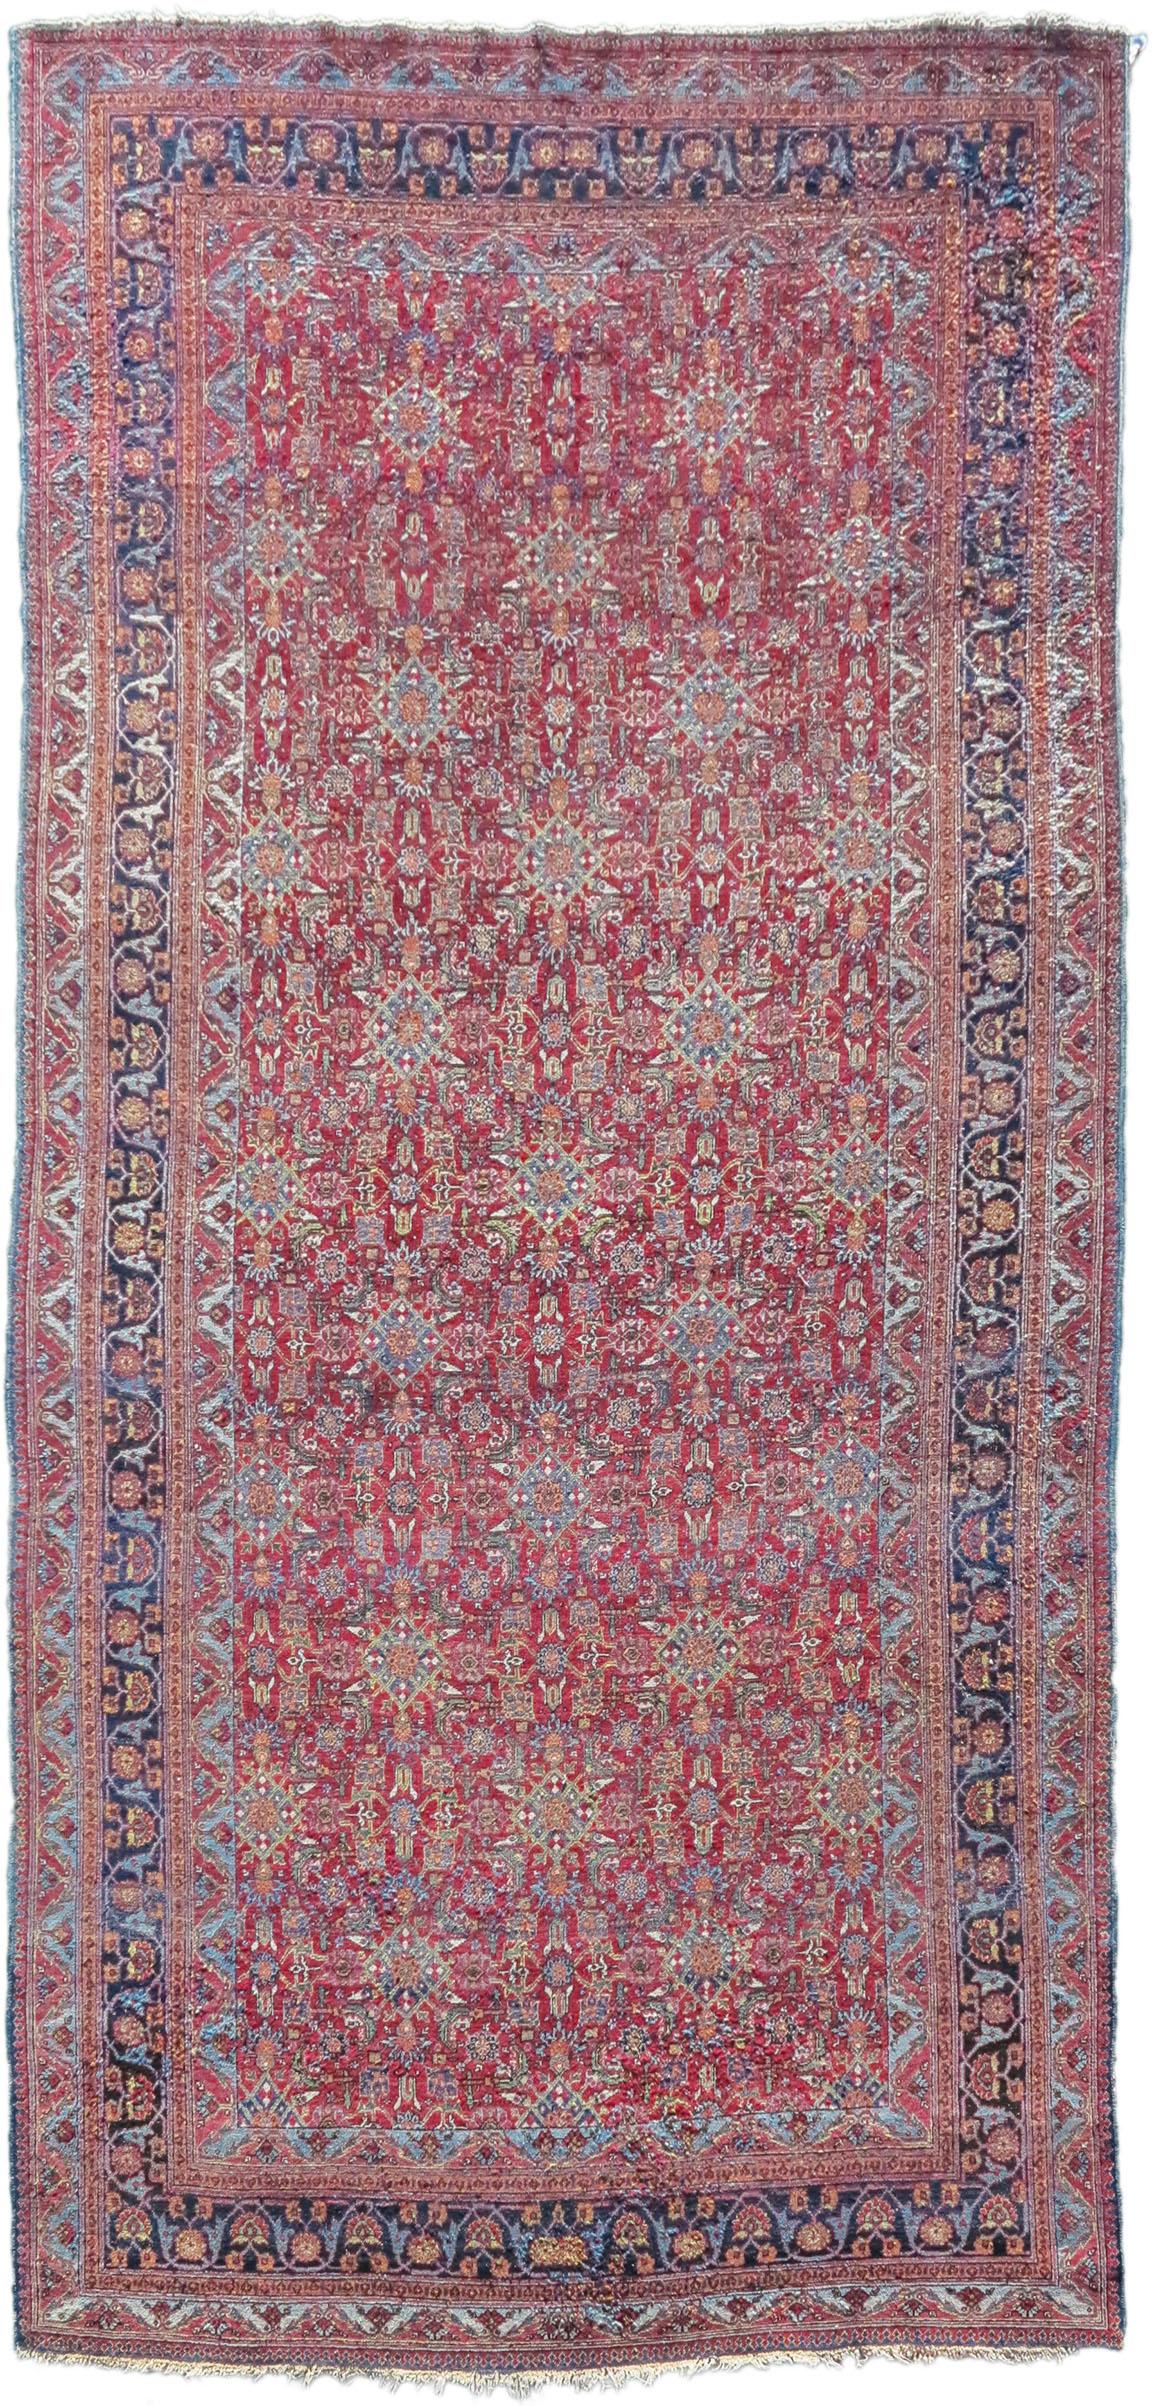 Khorassan rug